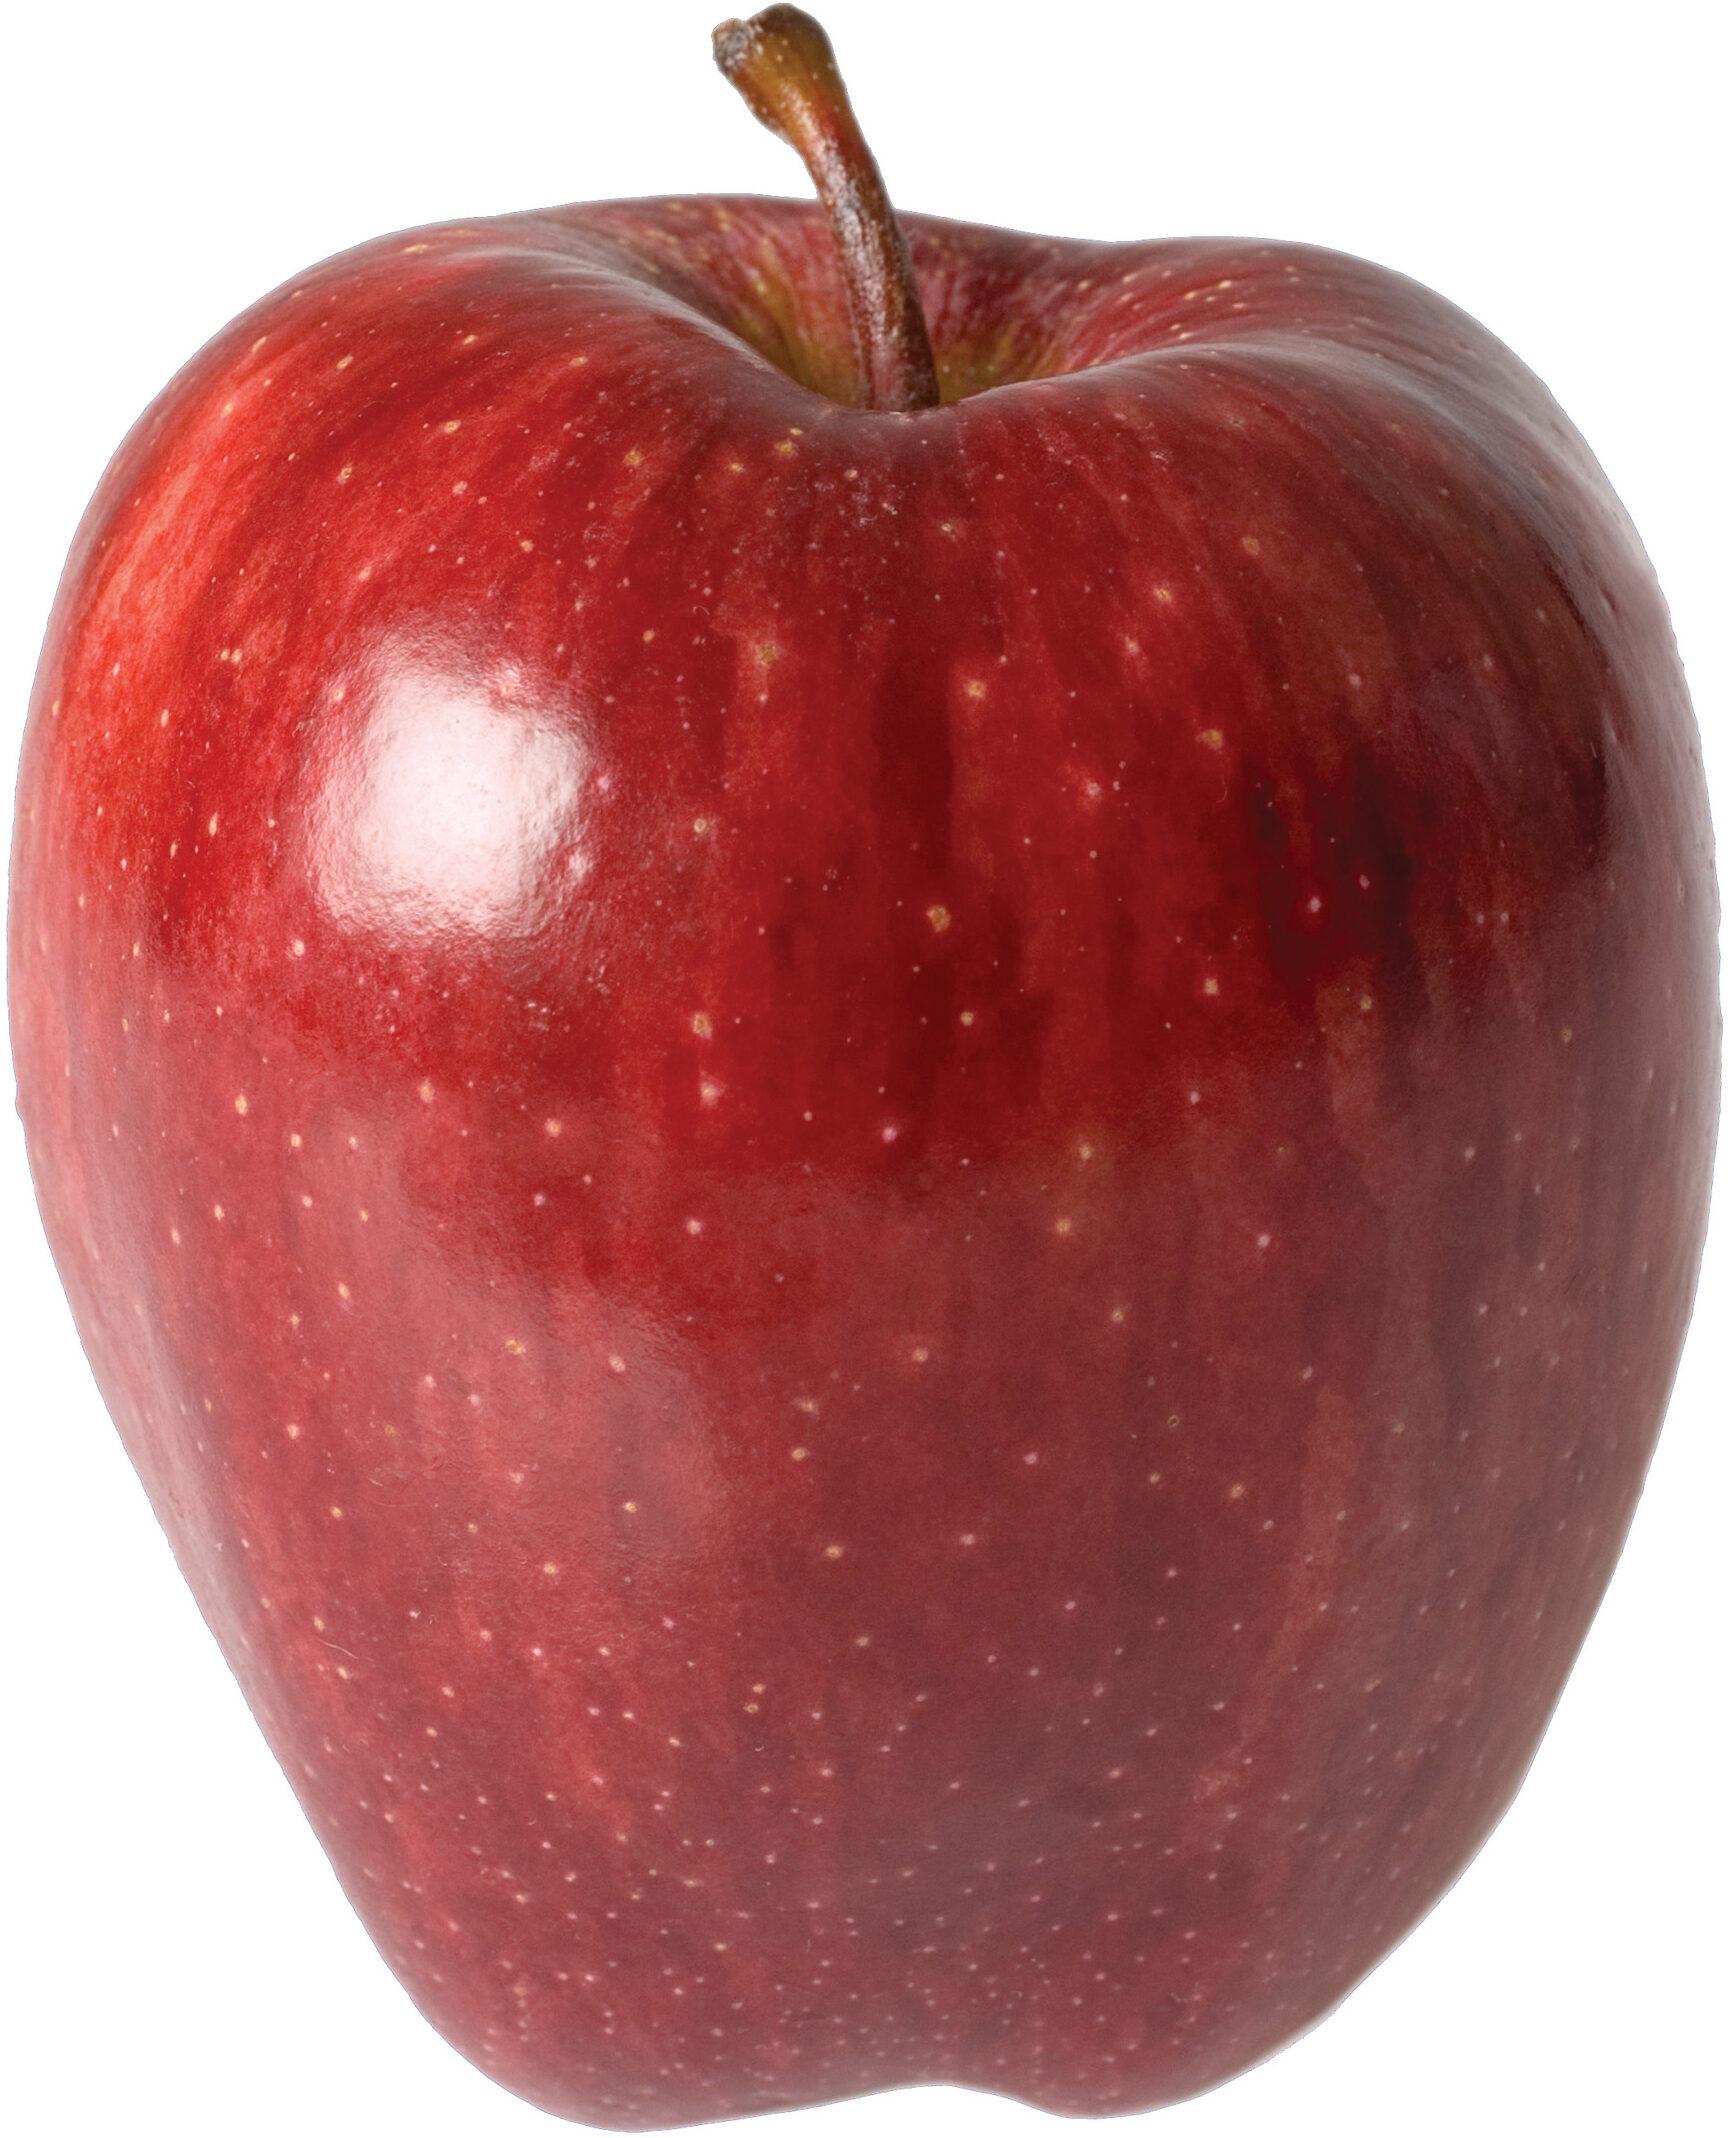 Apple - Product